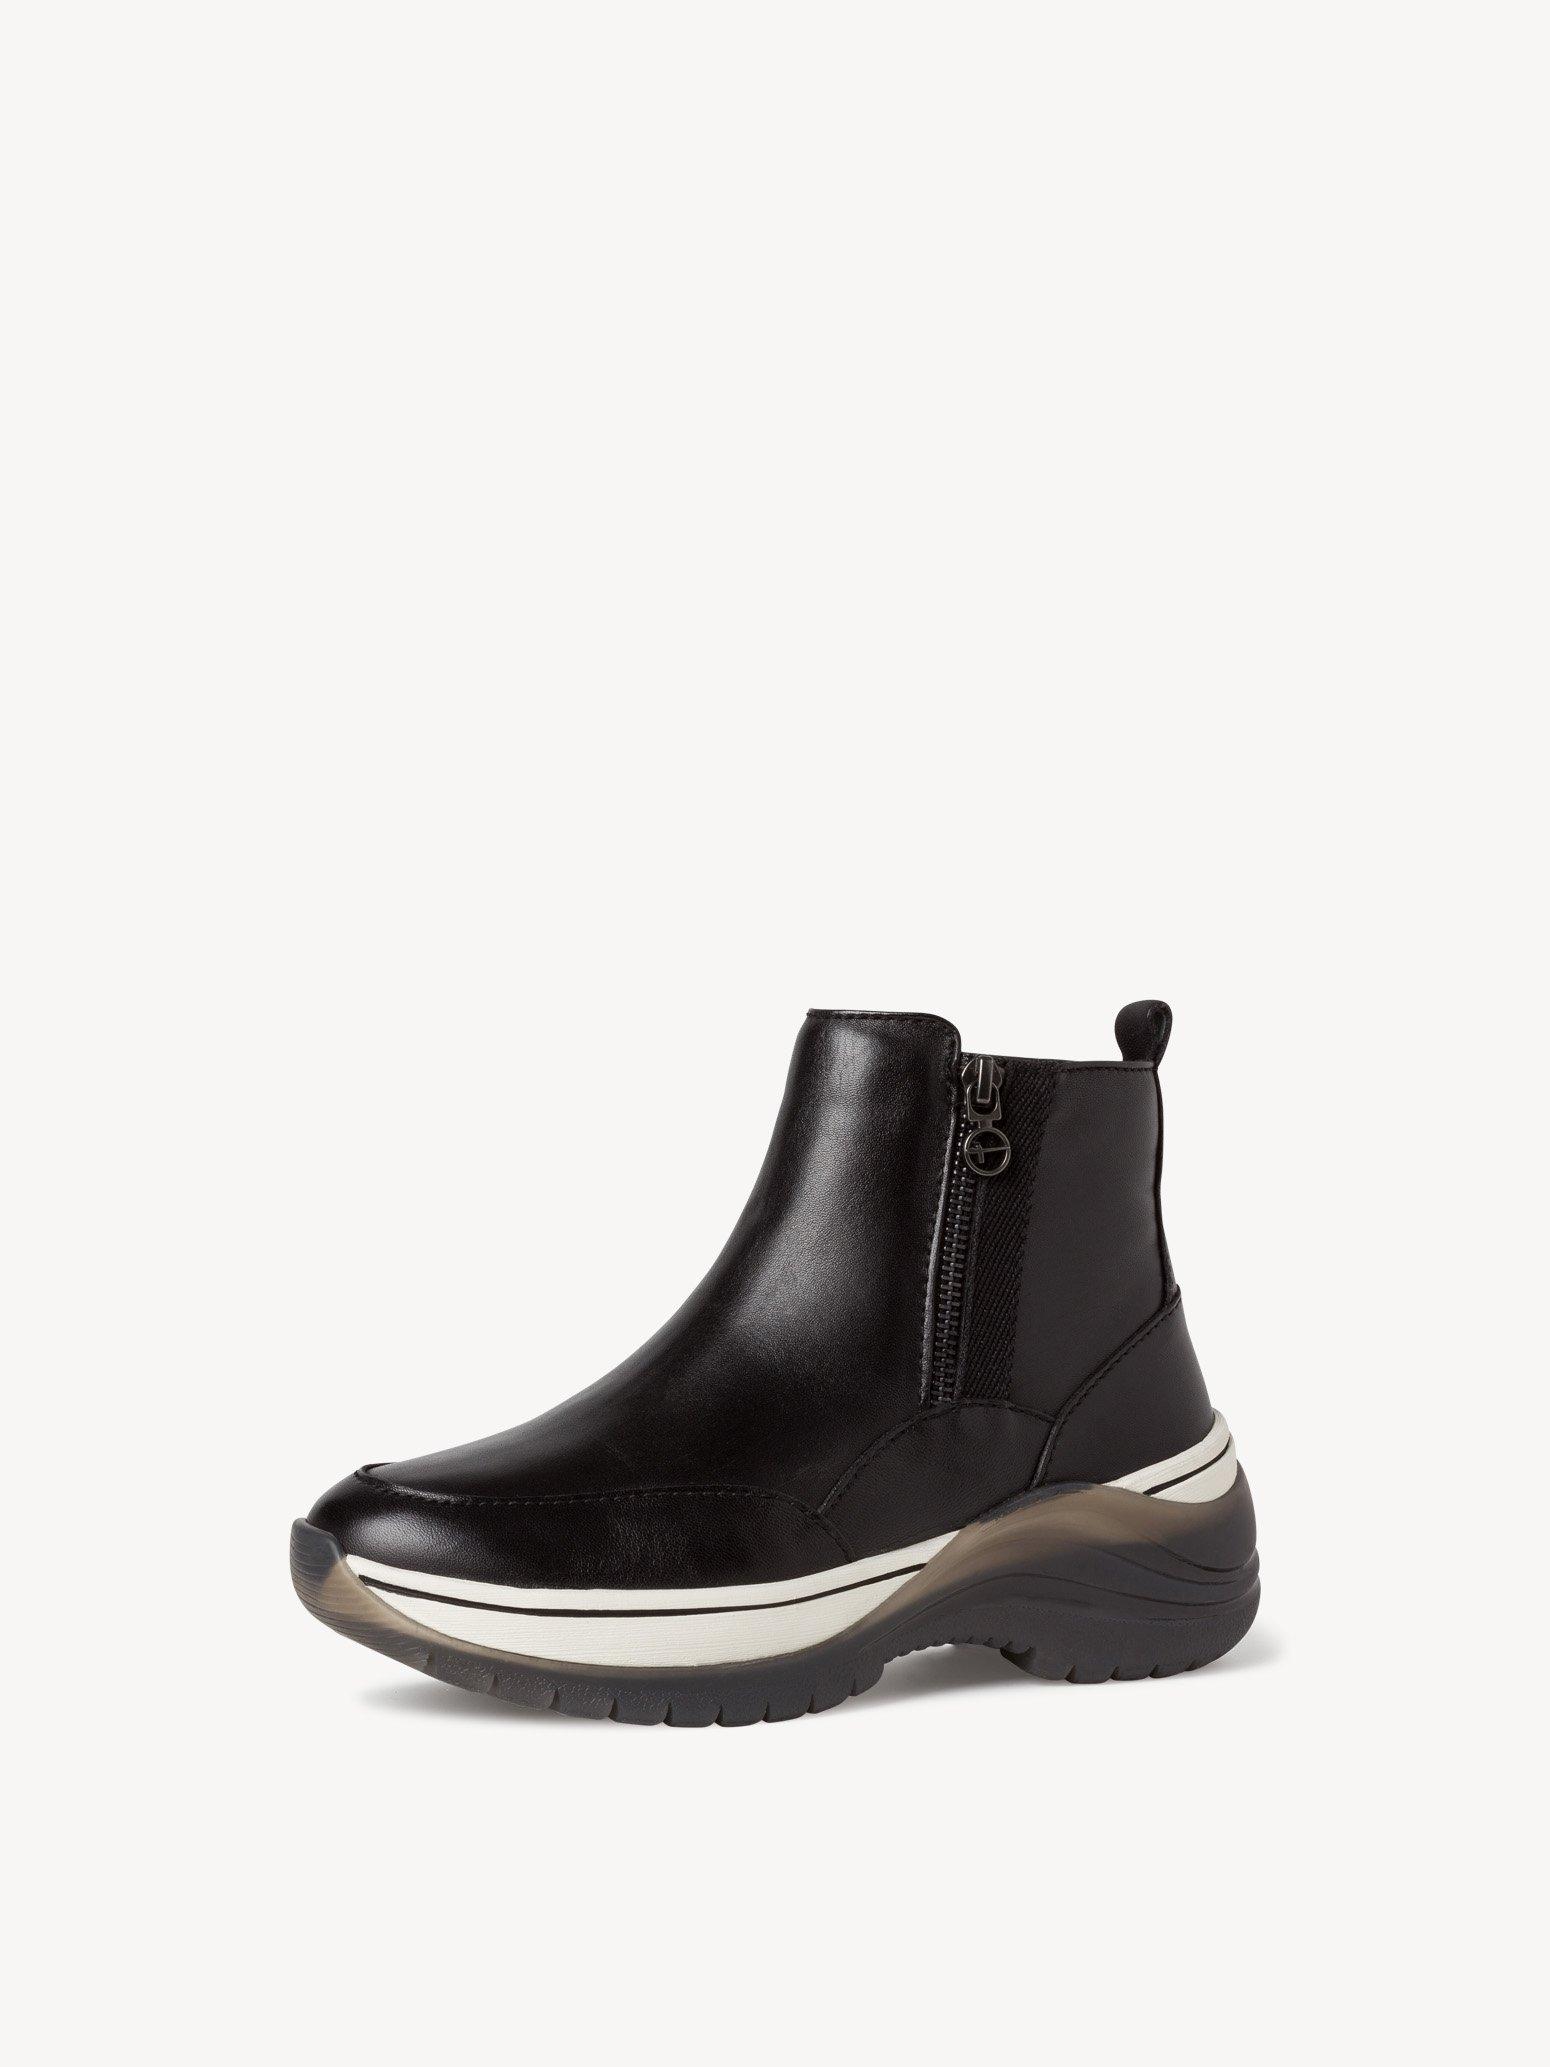 Ботинки Tamaris 1-1-25465-25-003